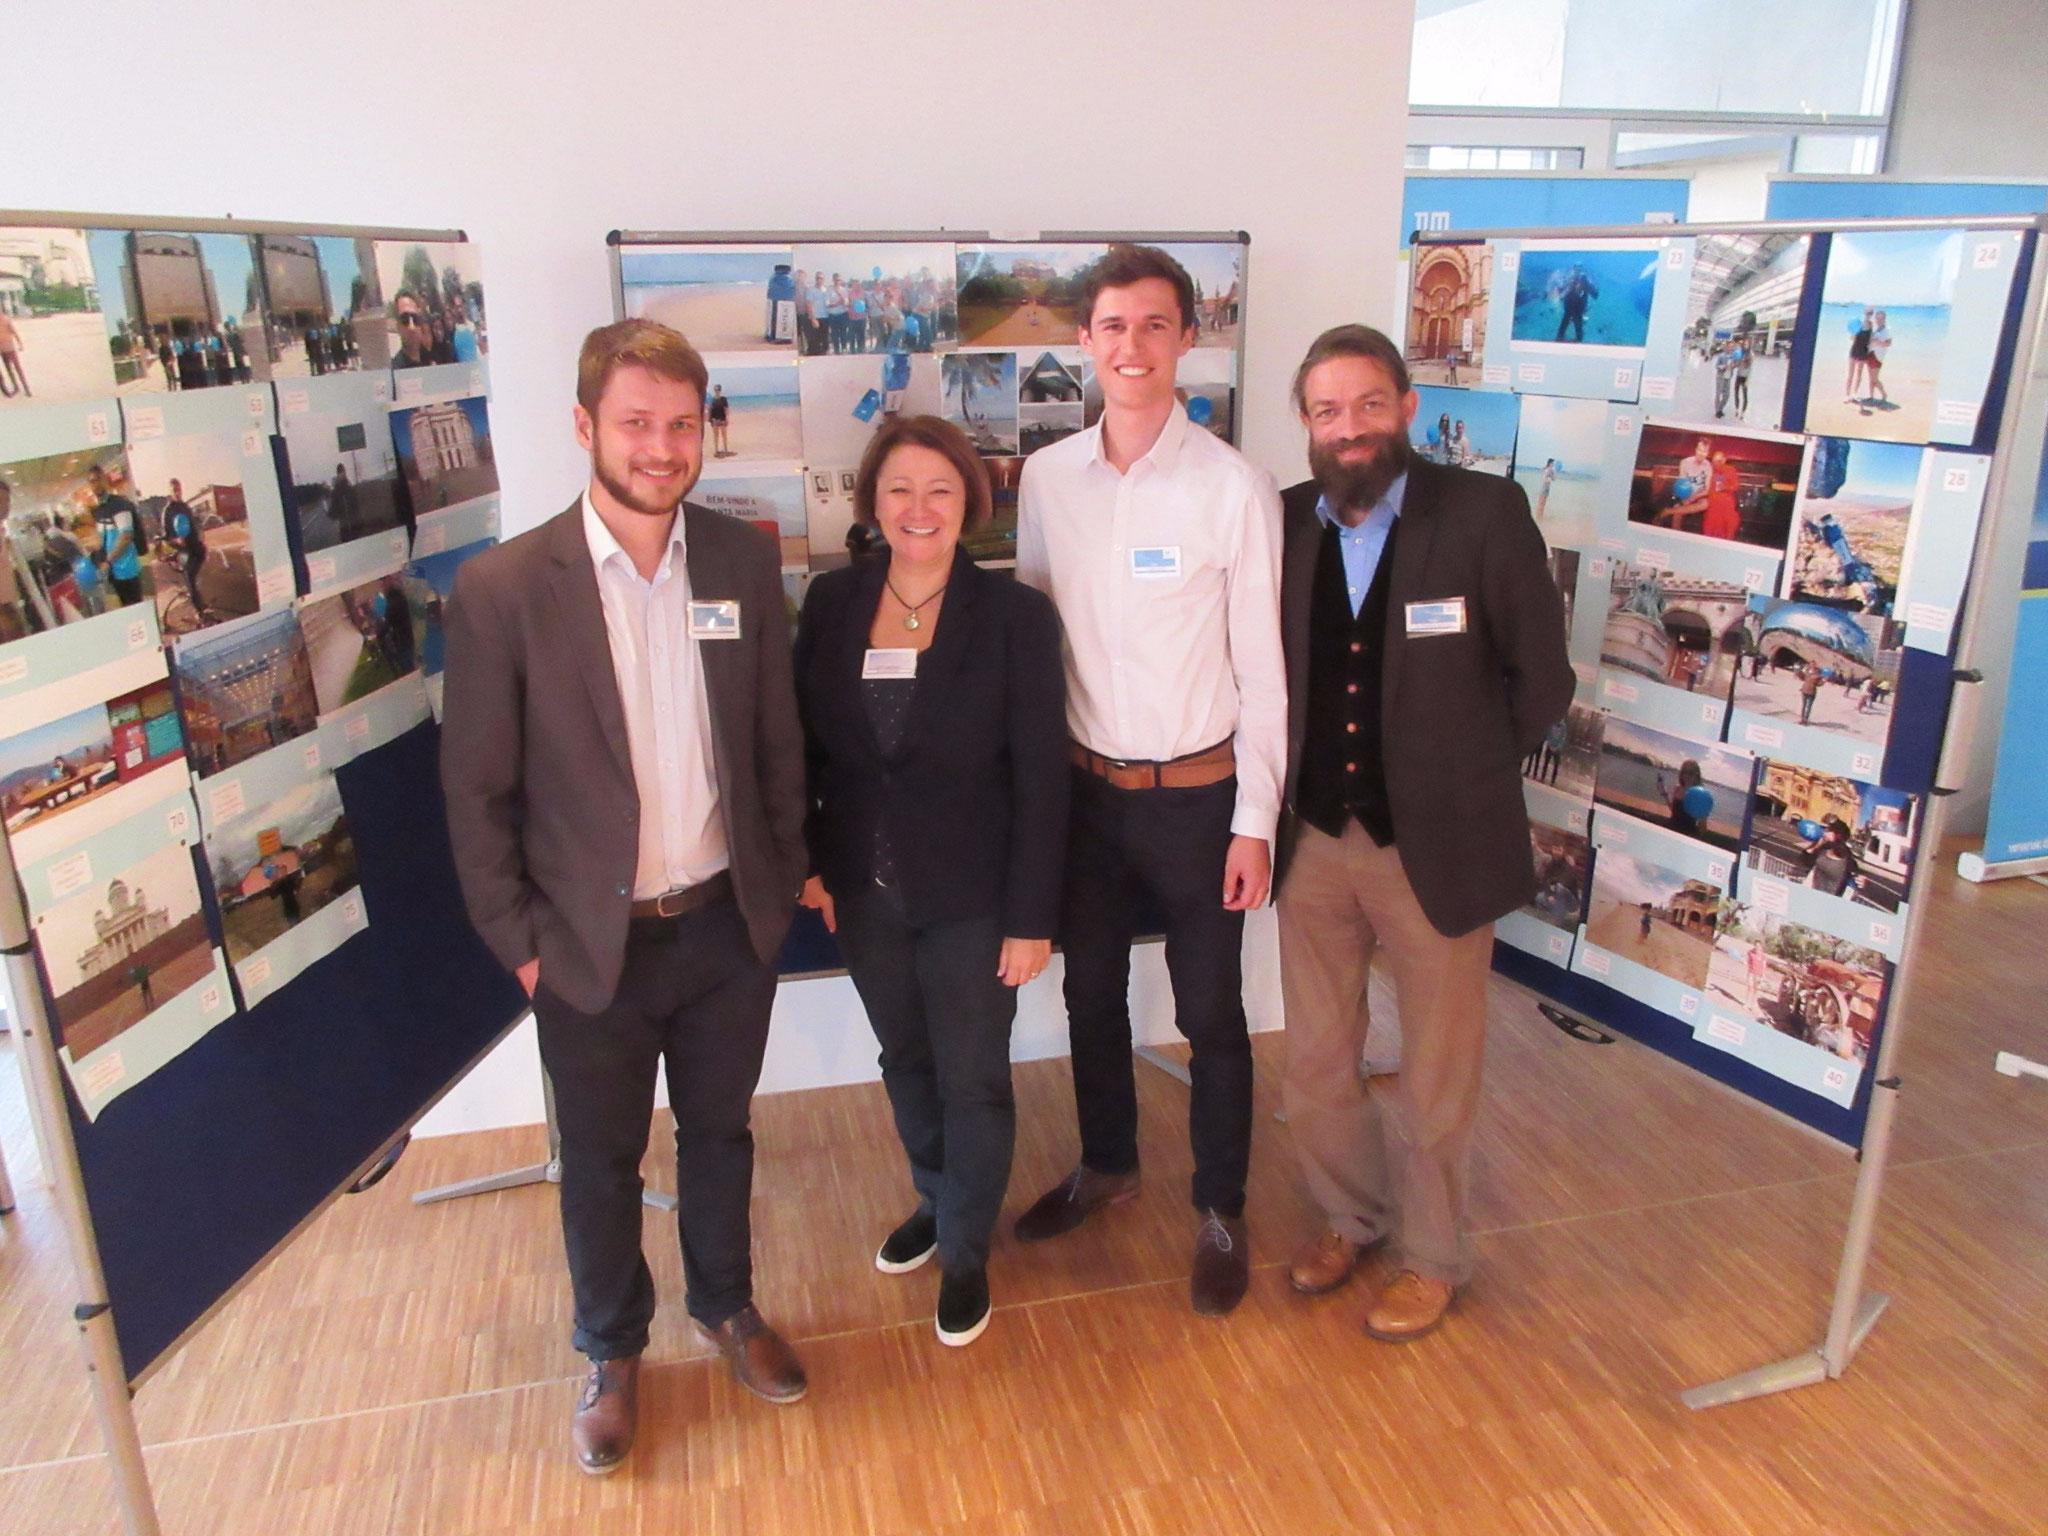 TUM DeSal Challenge 2016- Chair Thermodynamics with Dipl.-Ing. (Univ.) Alexander Kroiß, Simone Horvatin, (?), Dr.-Ing. Markus Spinnler